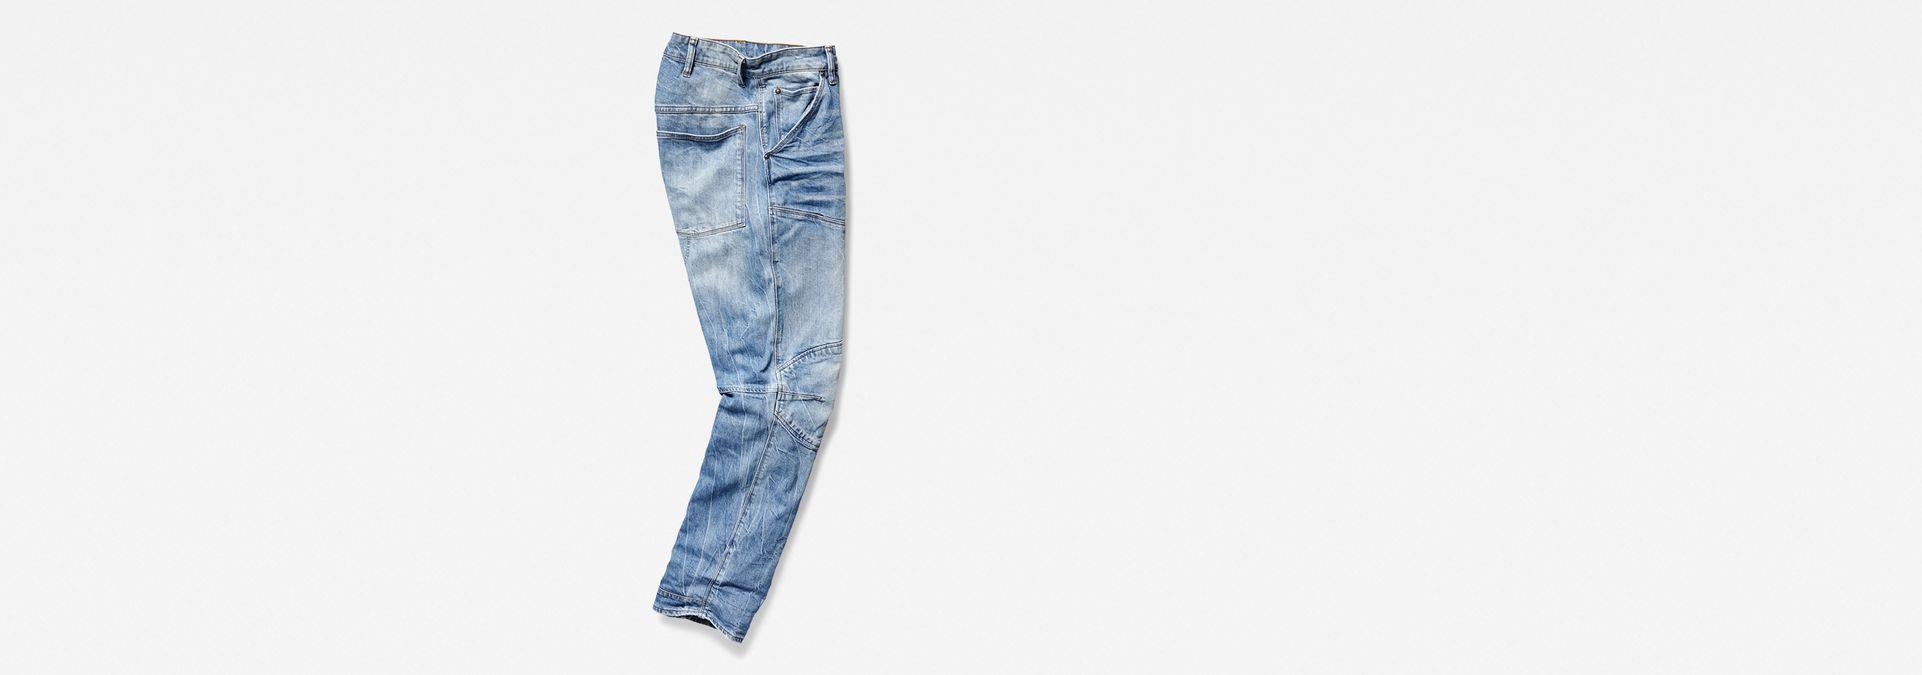 5620 G Star Elwood 3D Loose Jeans